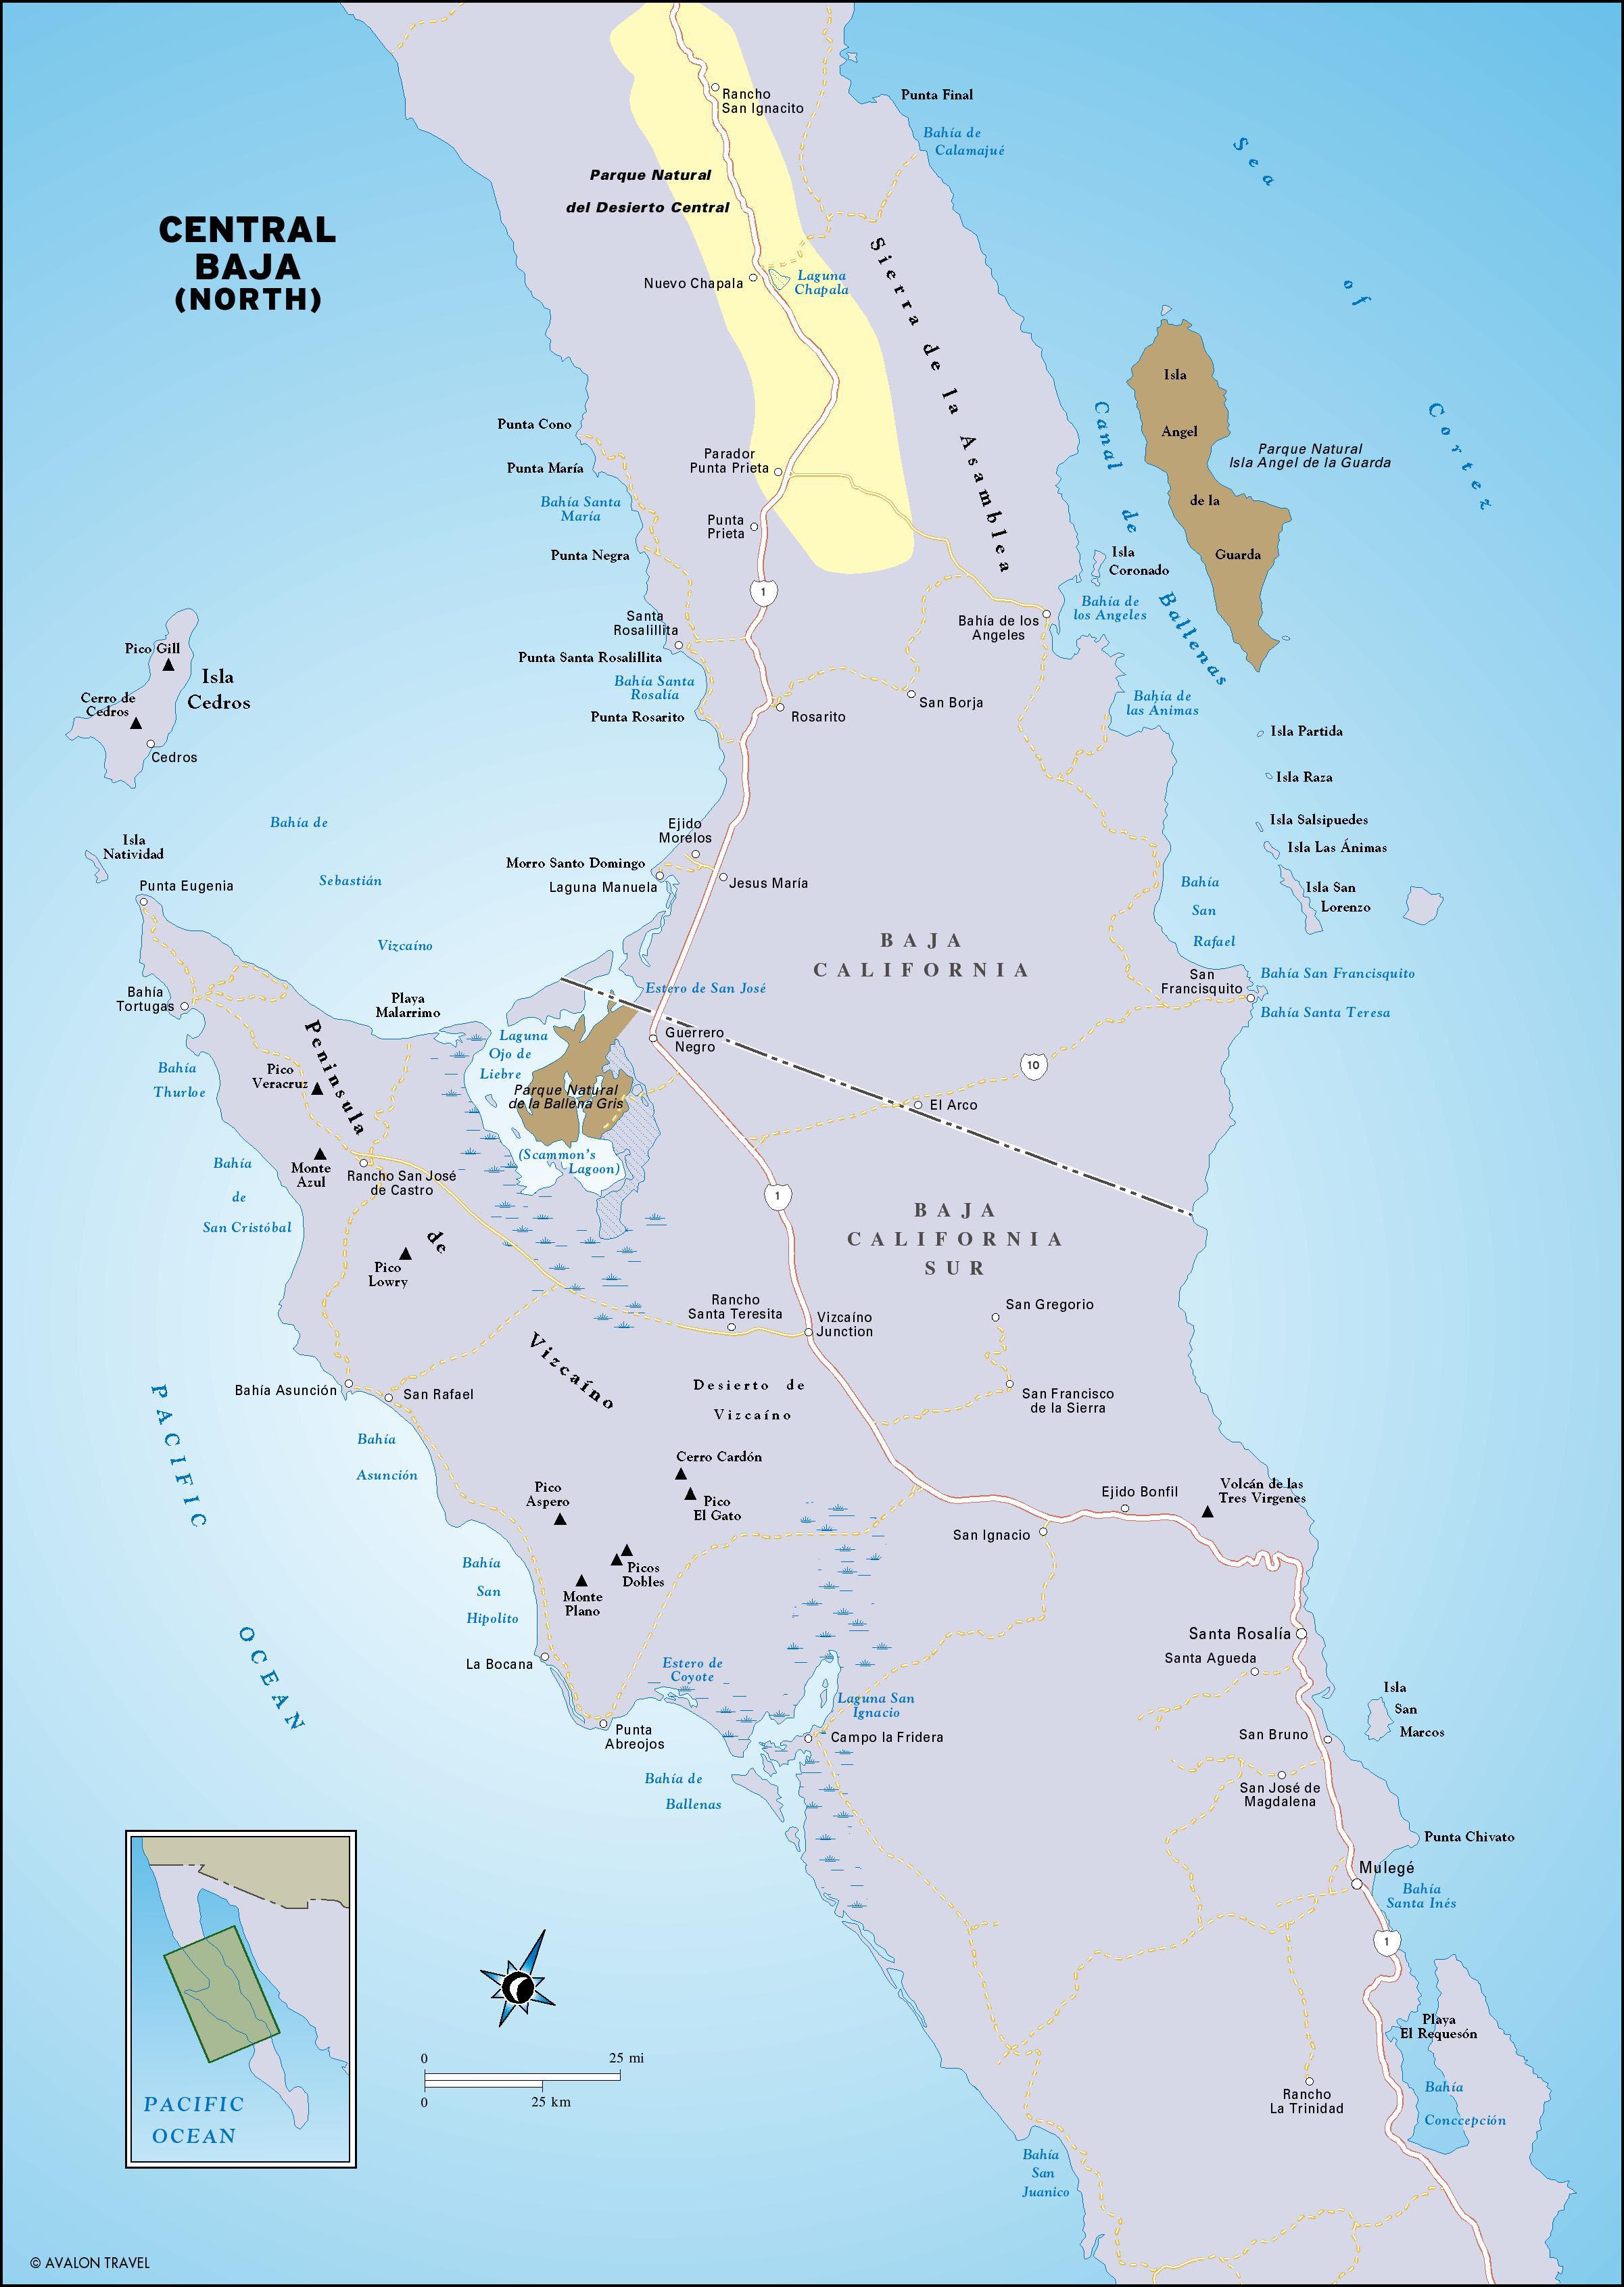 Baja | Avalon Travel San Juan Map Of Baja Mexico on las arenas baja mexico, el rosario baja mexico, los frailes baja mexico, todos santos baja mexico, la fortuna baja mexico, la paz baja mexico, puerto nuevo baja mexico, las palmas baja mexico, de los angeles baja mexico, el socorro baja mexico, las animas baja mexico,